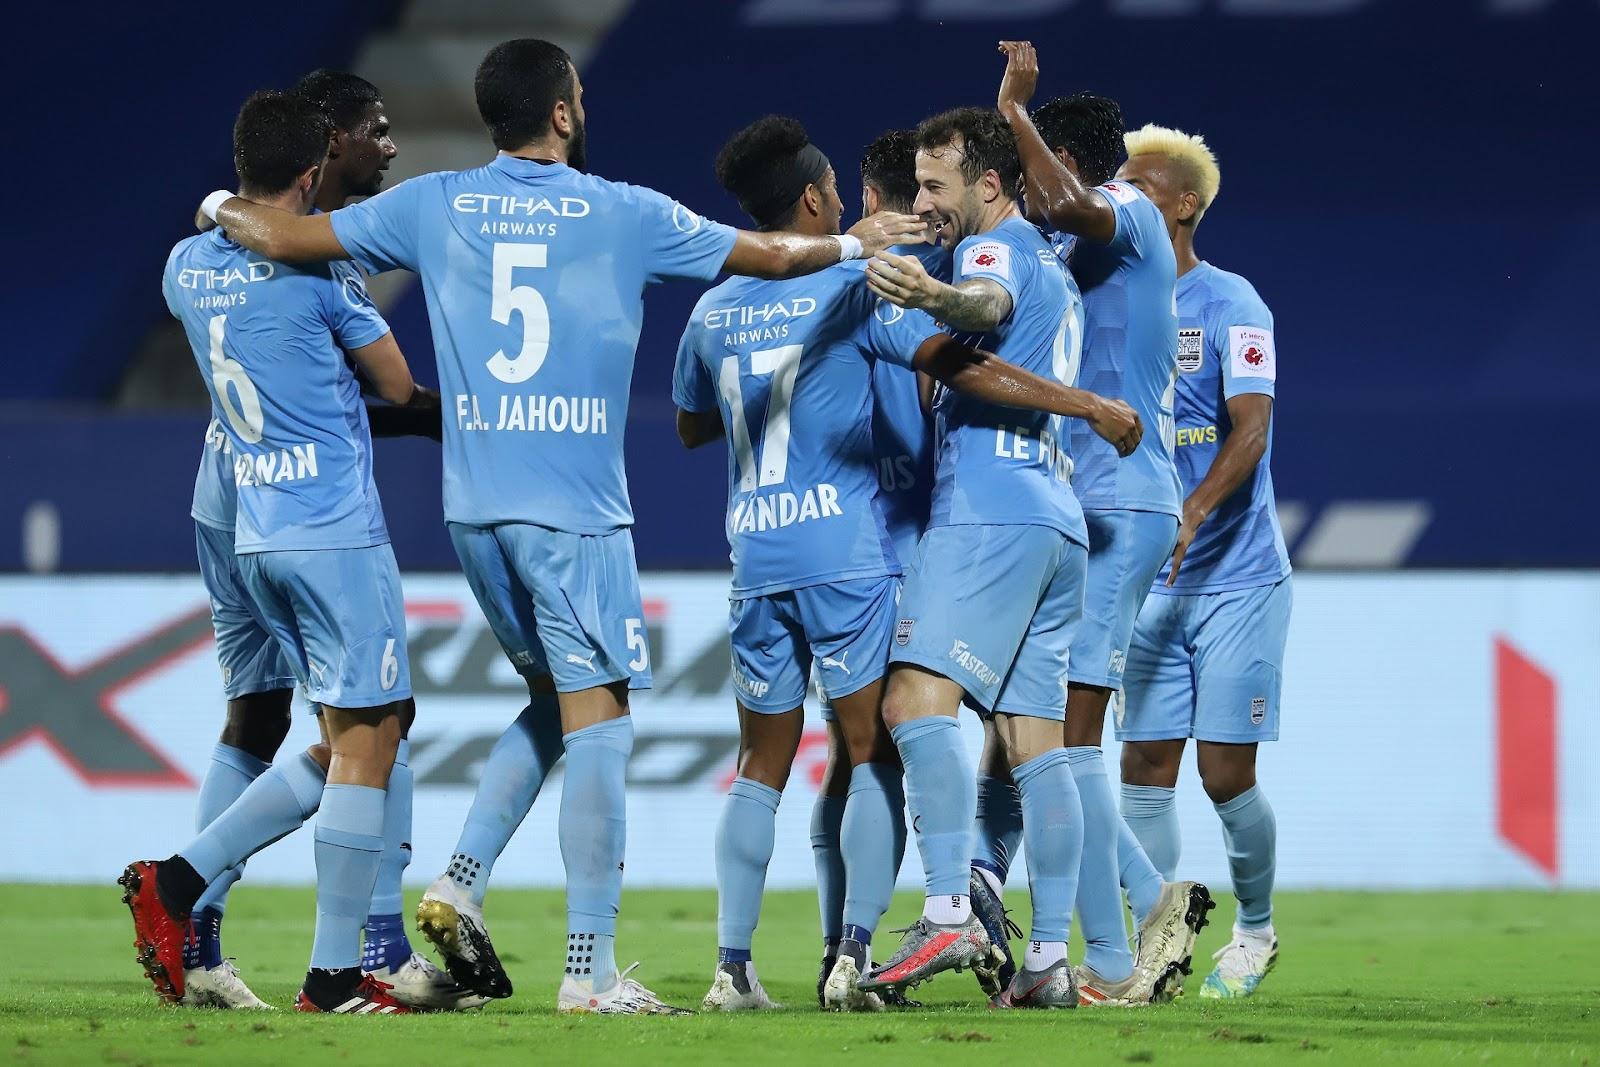 Mumbai City FC players celebrating a goal earlier this season